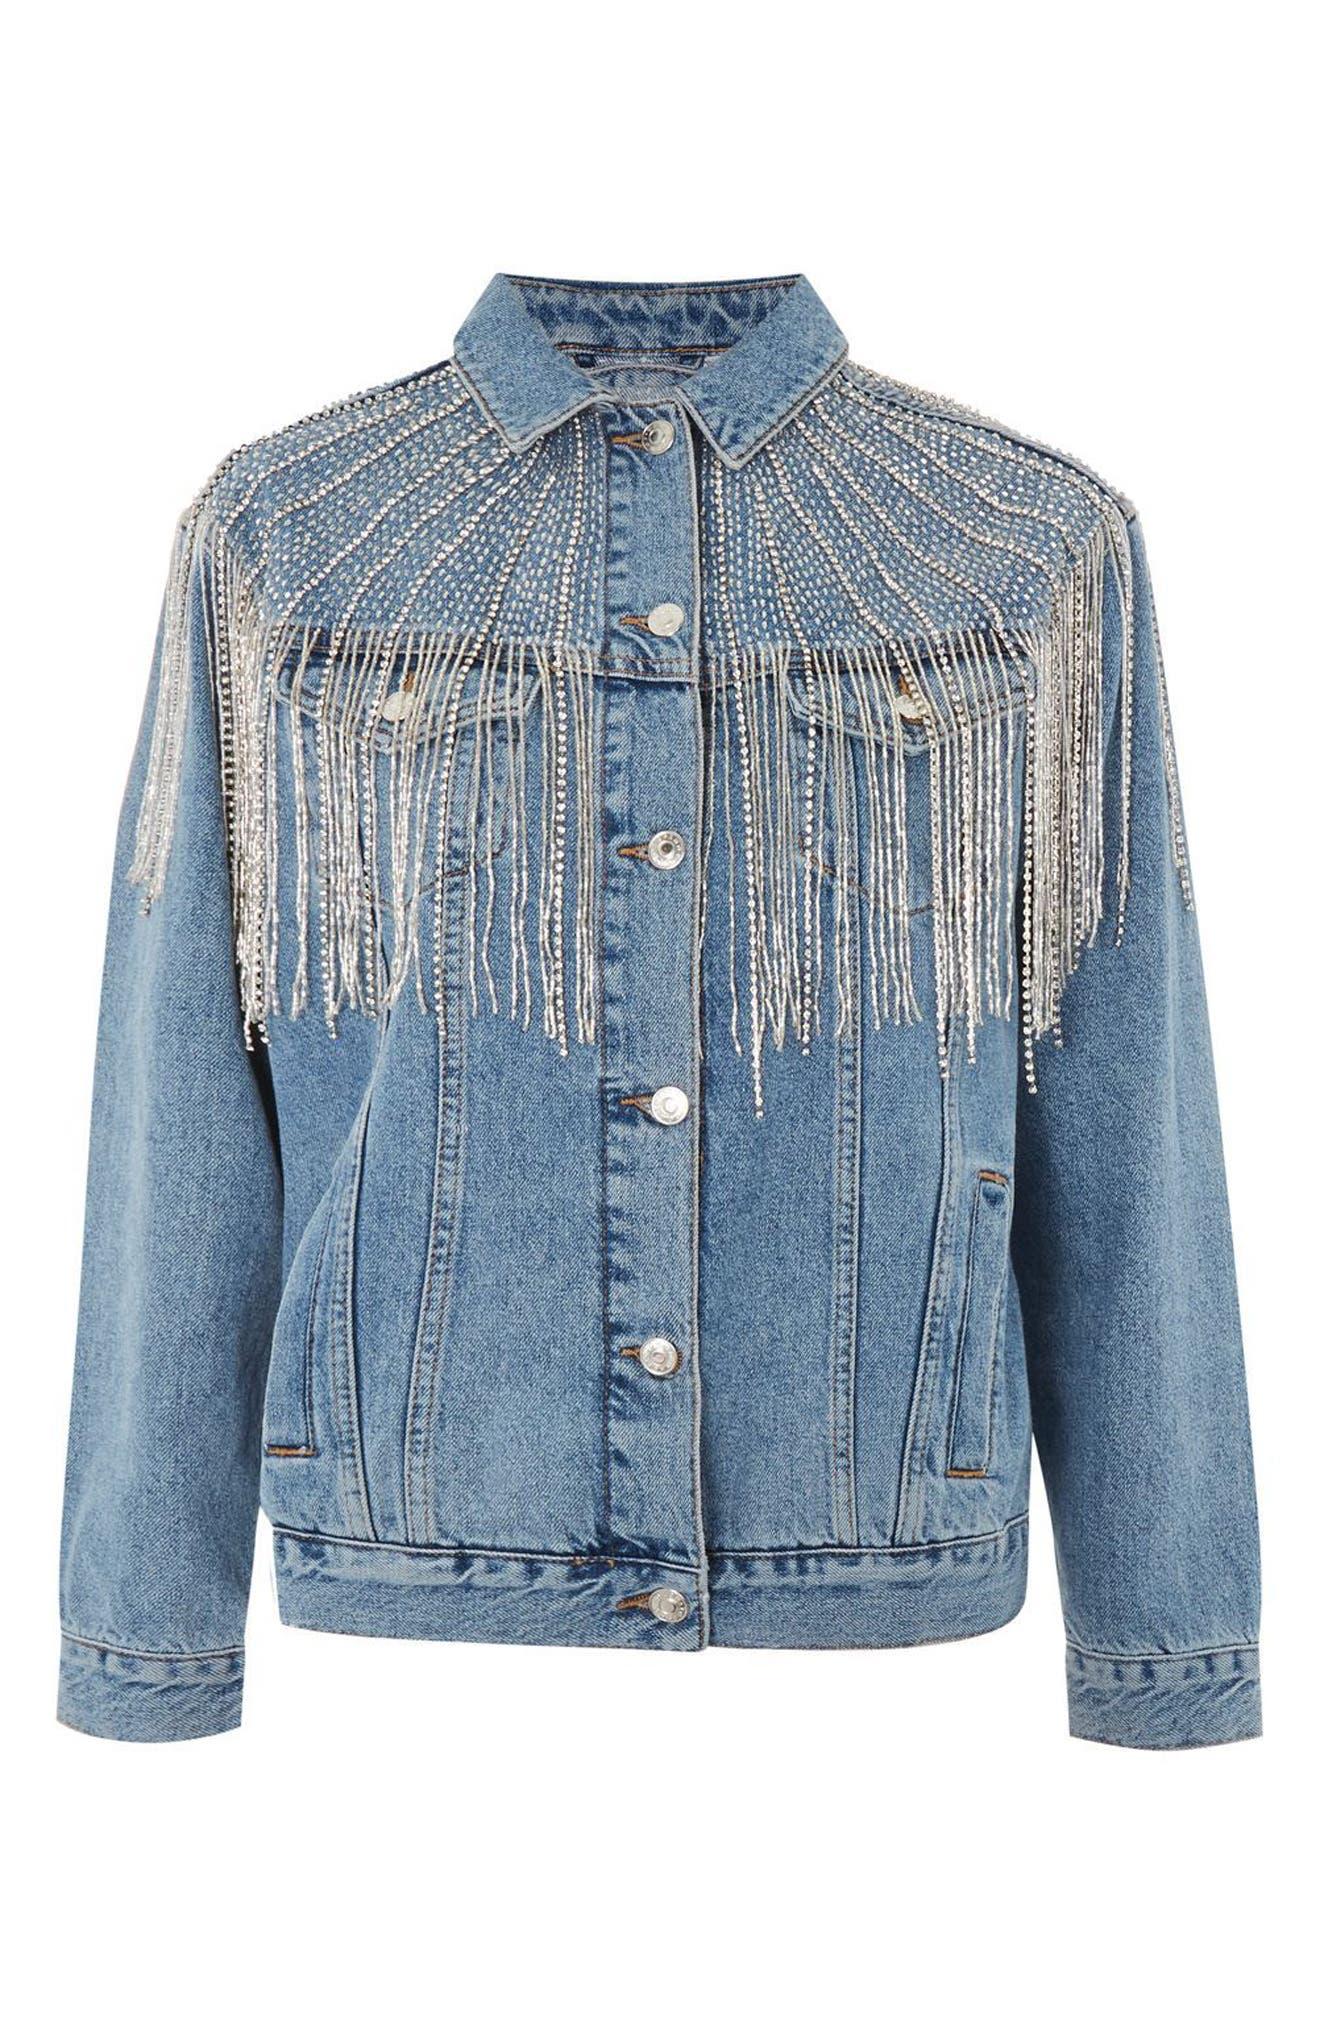 Dolly Sequin Fringe Denim Jacket,                             Alternate thumbnail 3, color,                             400